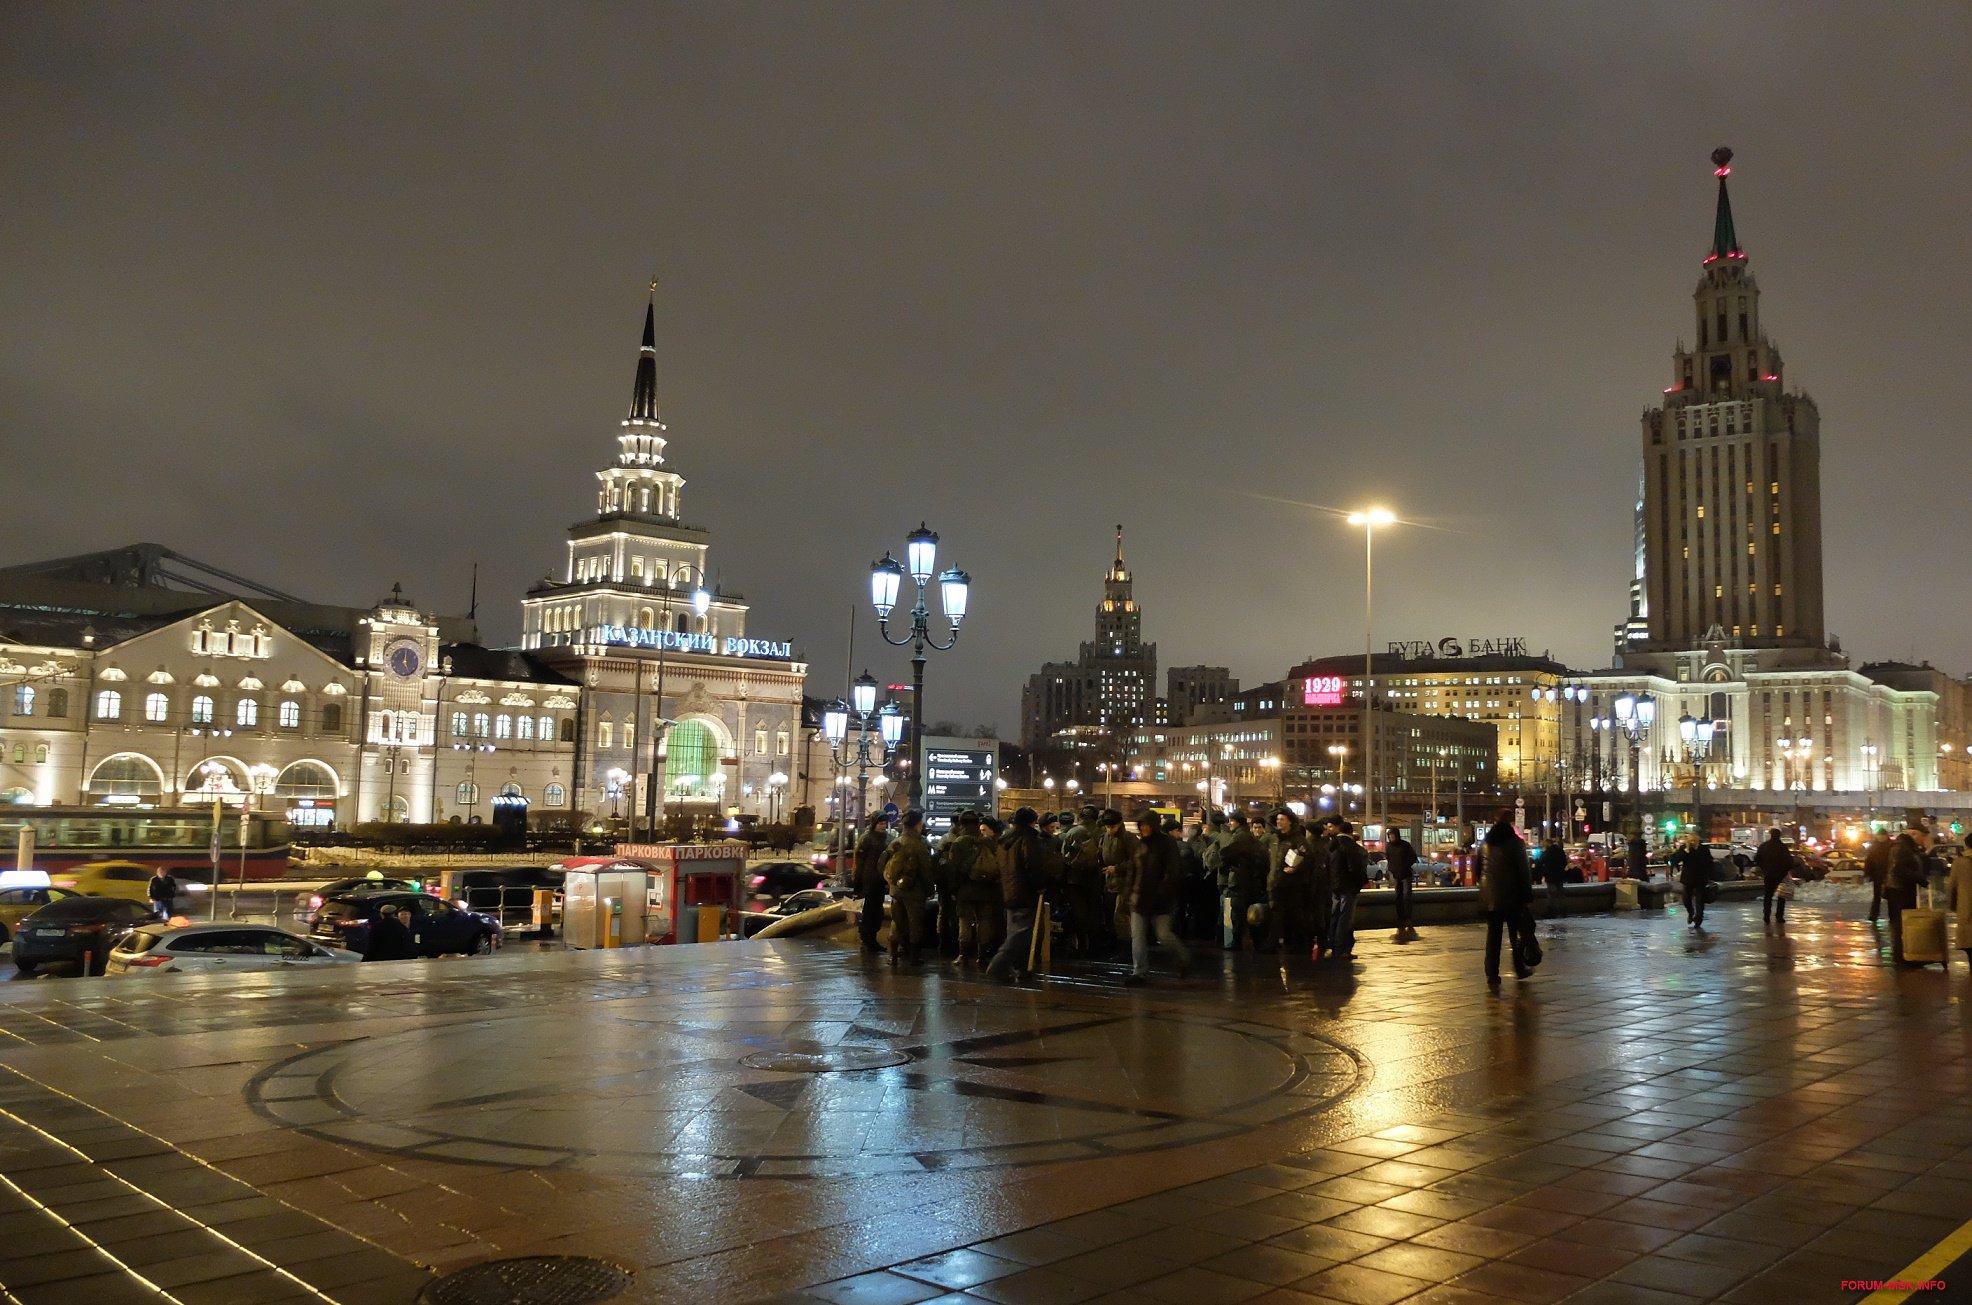 Москва площадь трех вокзалов картинки, надписи картинками